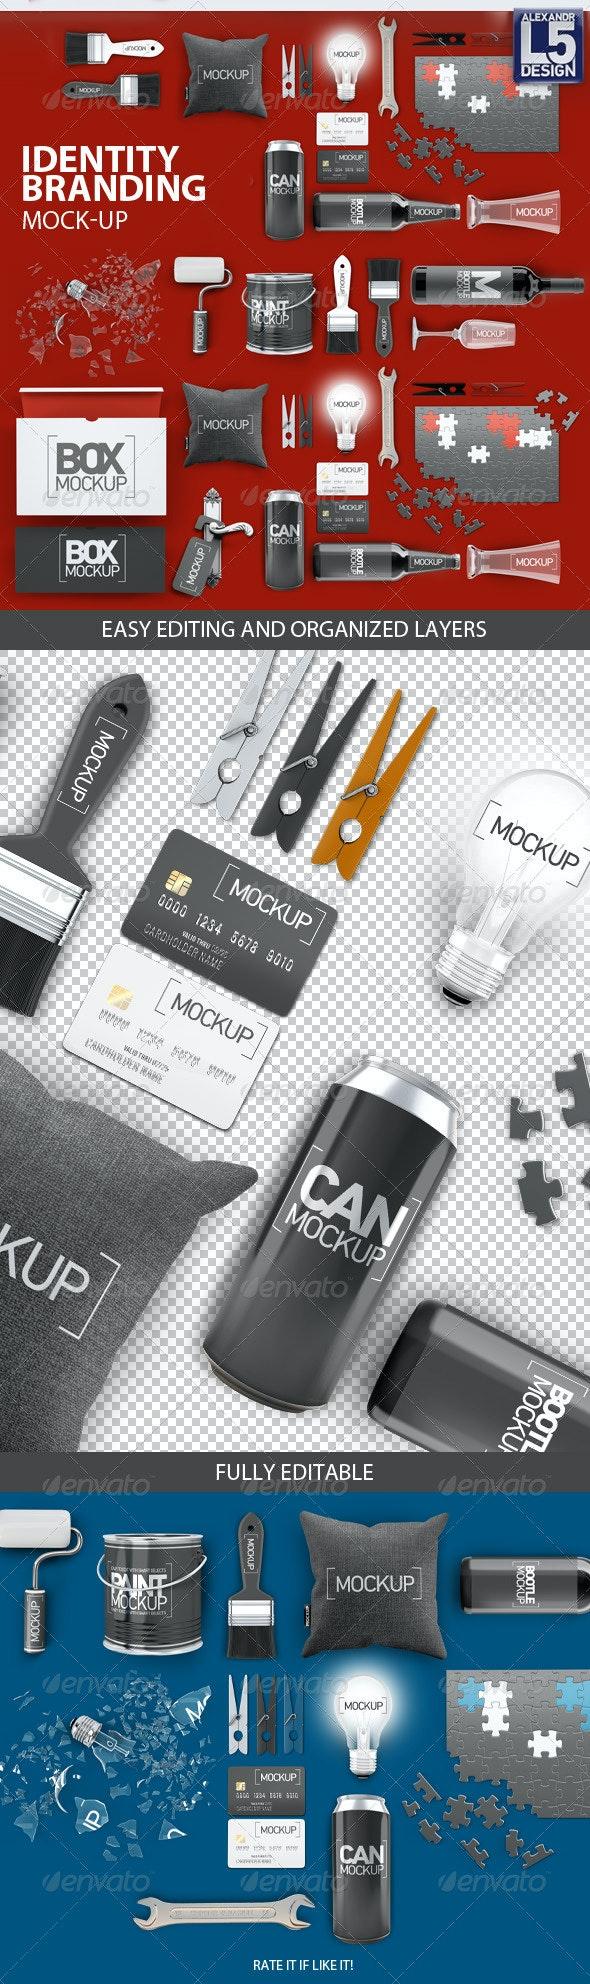 Identity Branding Mock-Up - Print Product Mock-Ups